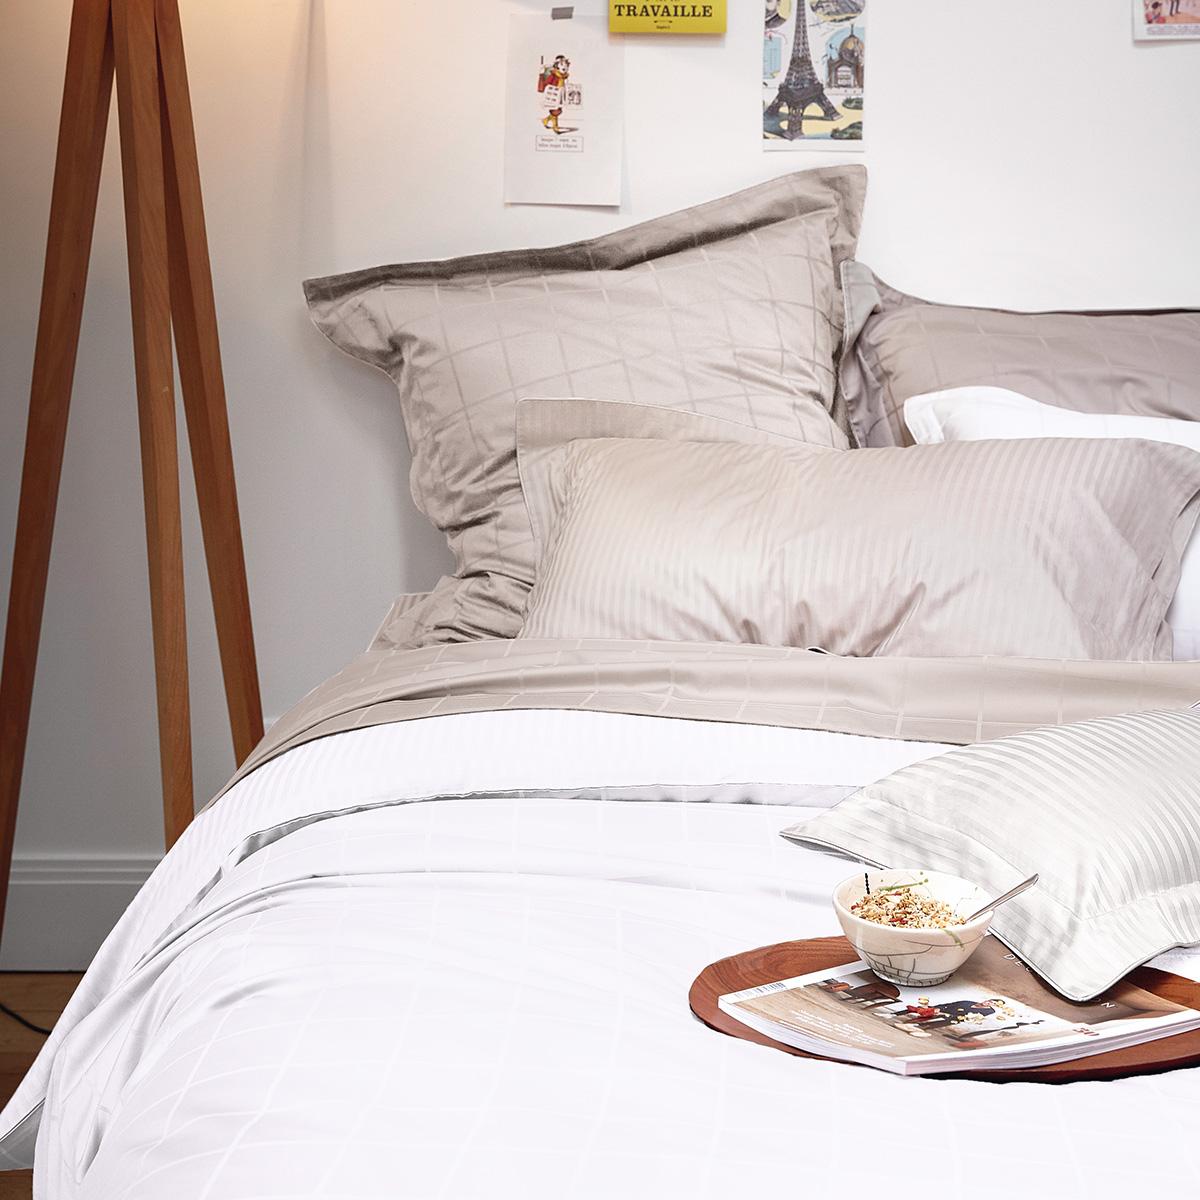 Drap housse satin Blanc 180 x 200 cm